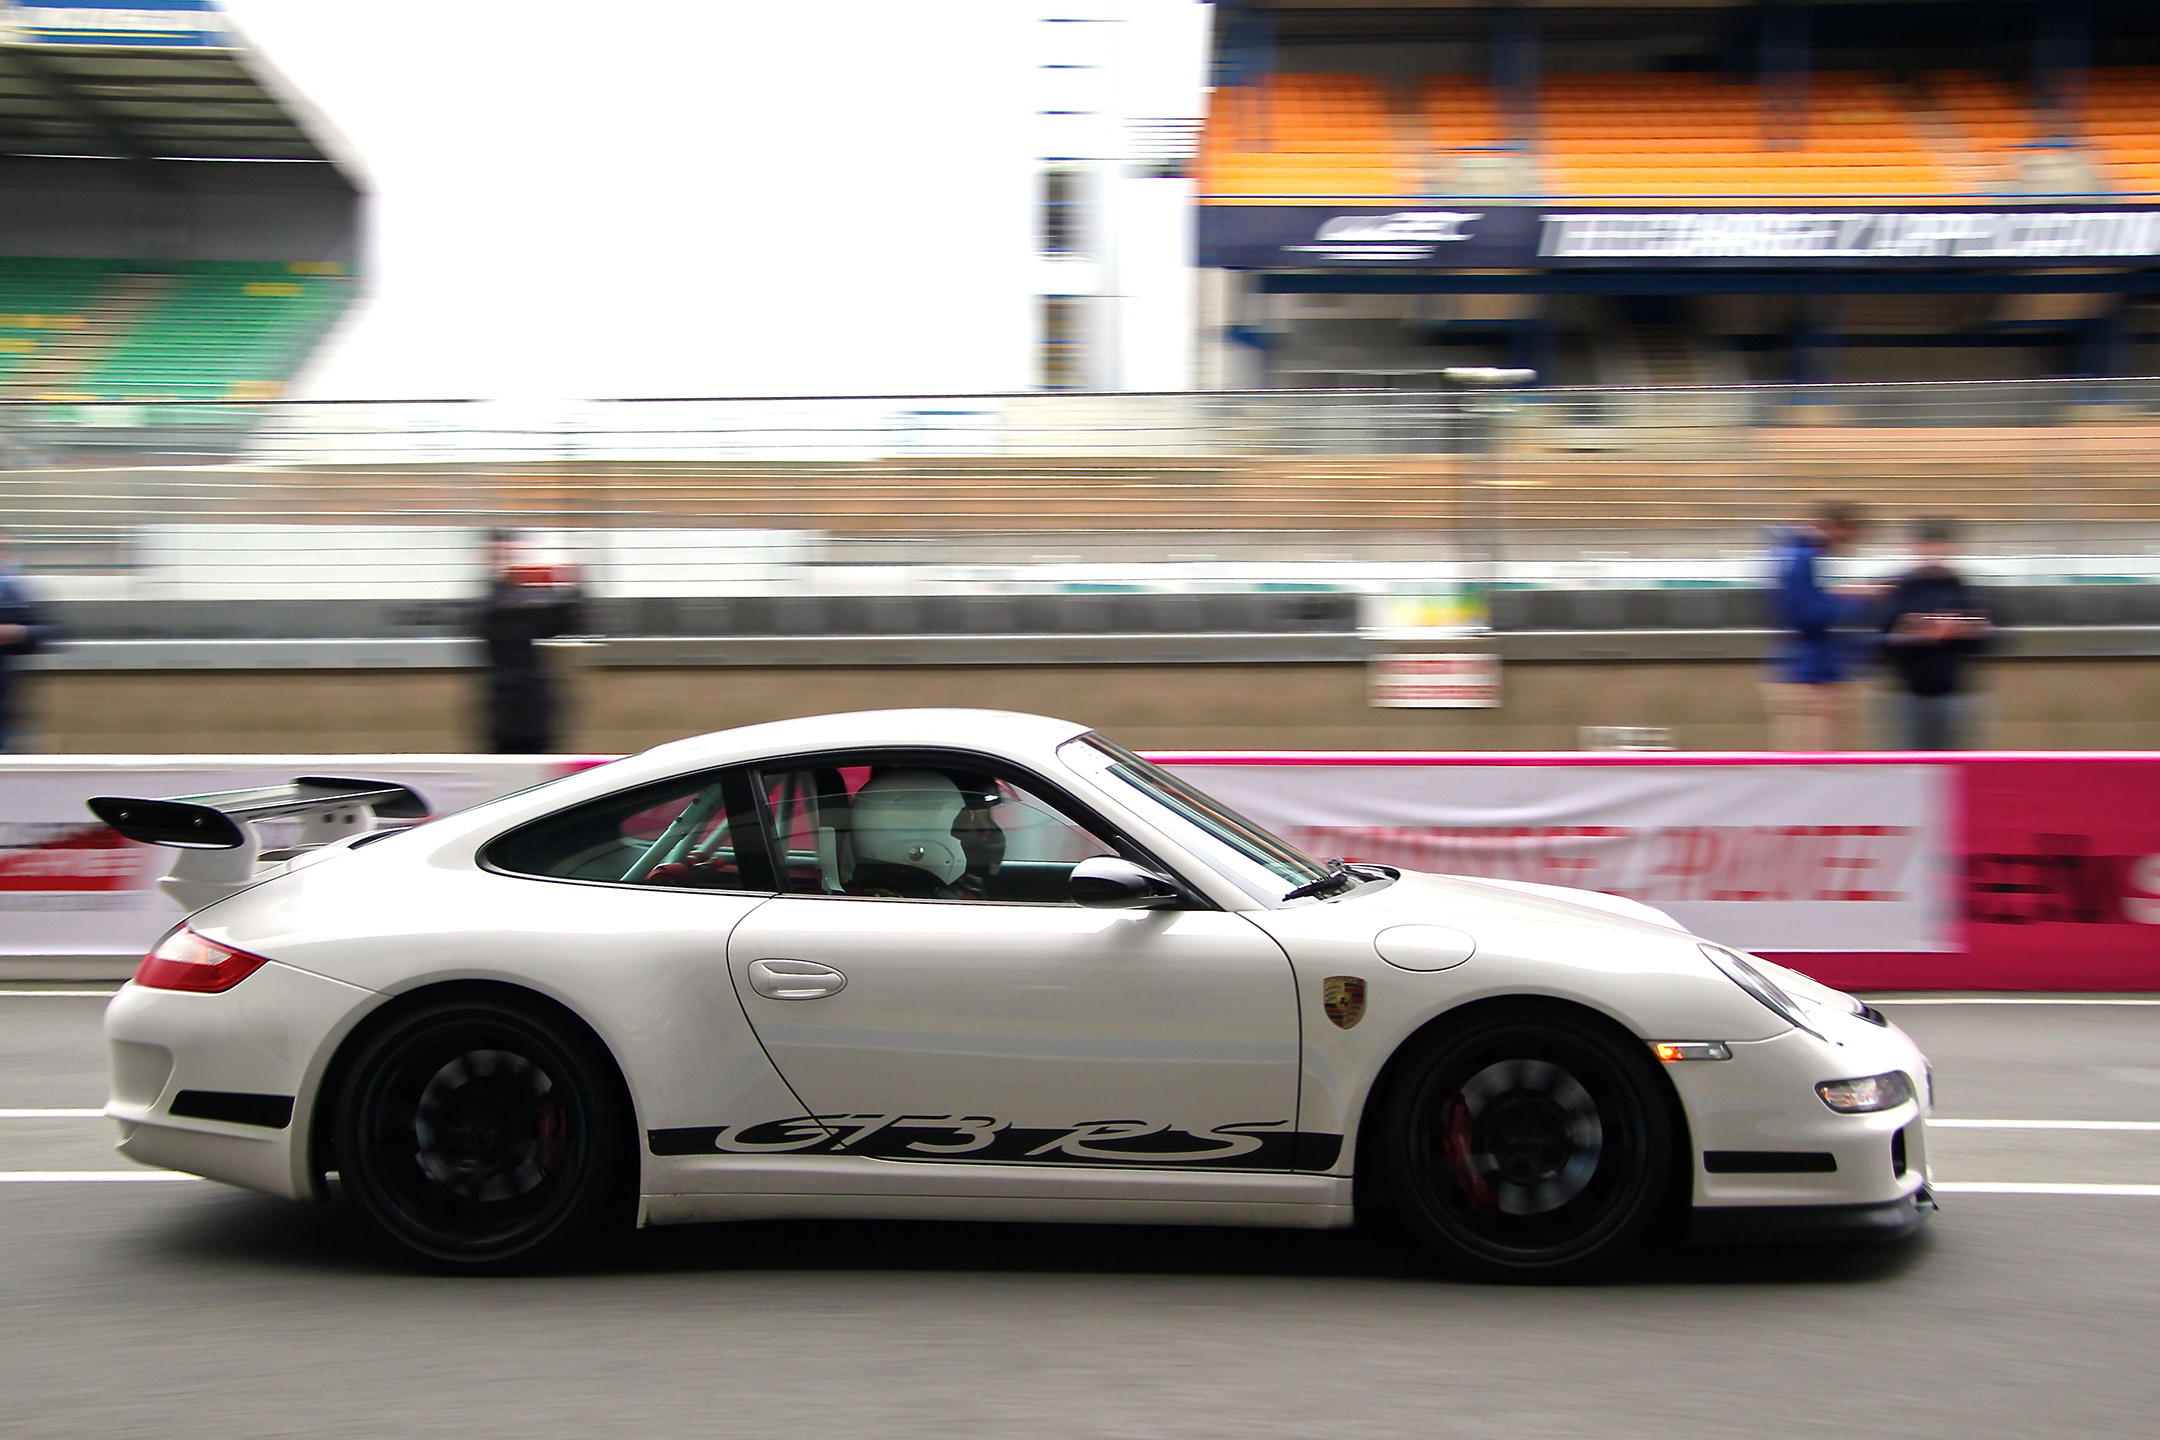 Porsche GT3 RS -  - speed side-face - Exclusive Drive 2017 - photo Ludo Ferrari